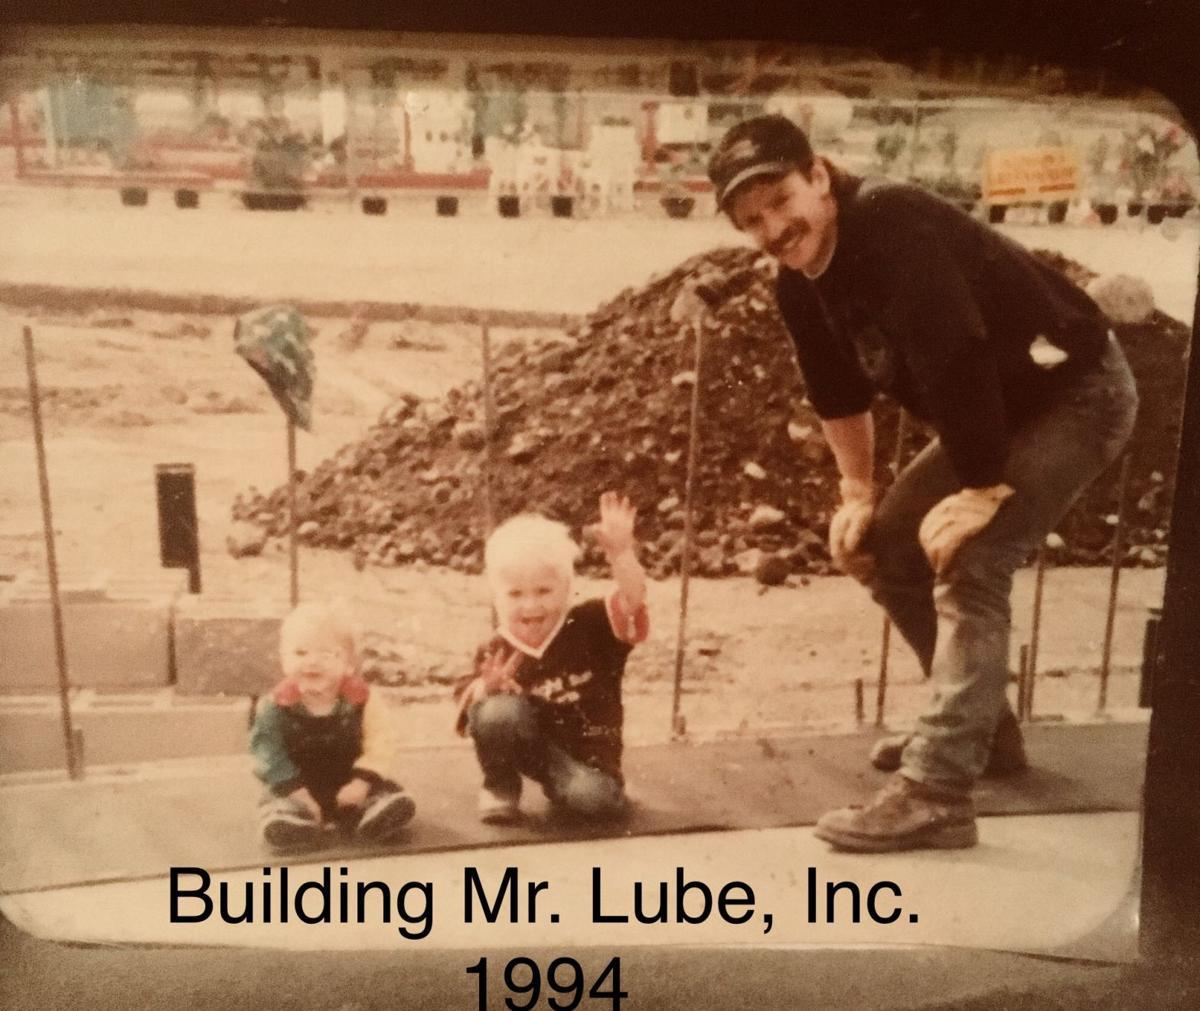 Mr. Lube